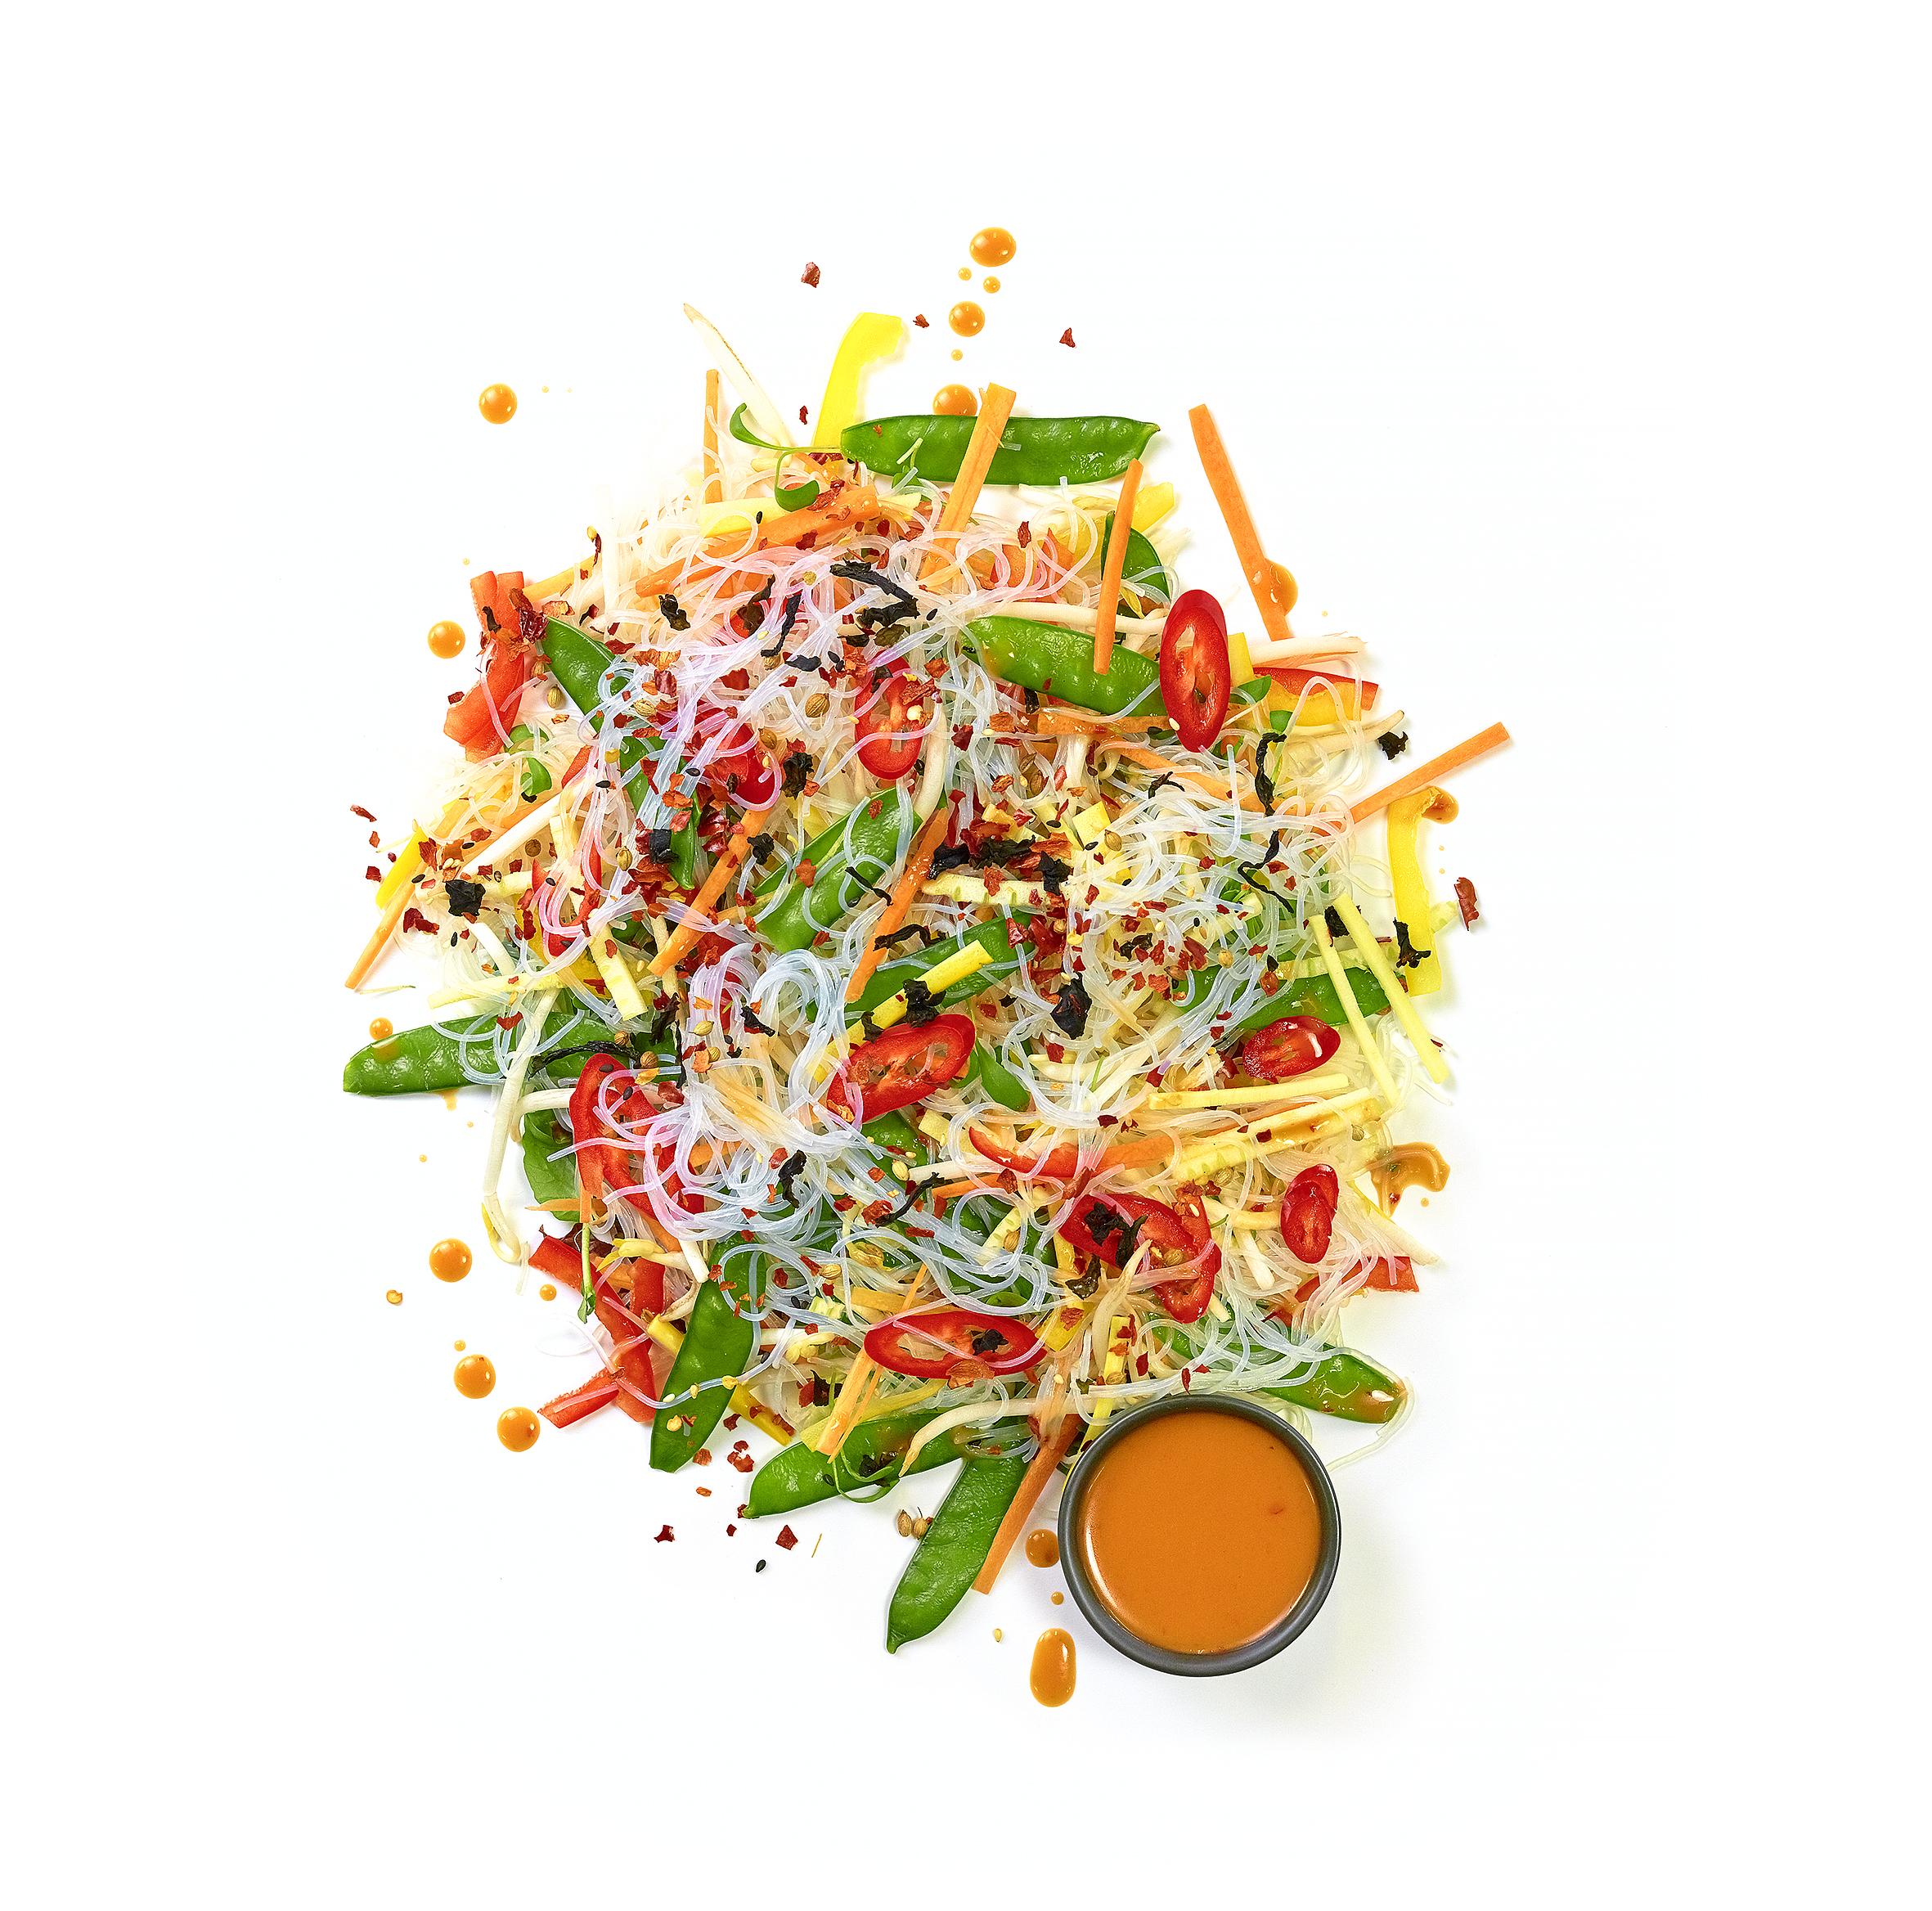 Kabuki_Salads_1528_Mild-Chili-Mit-rgb